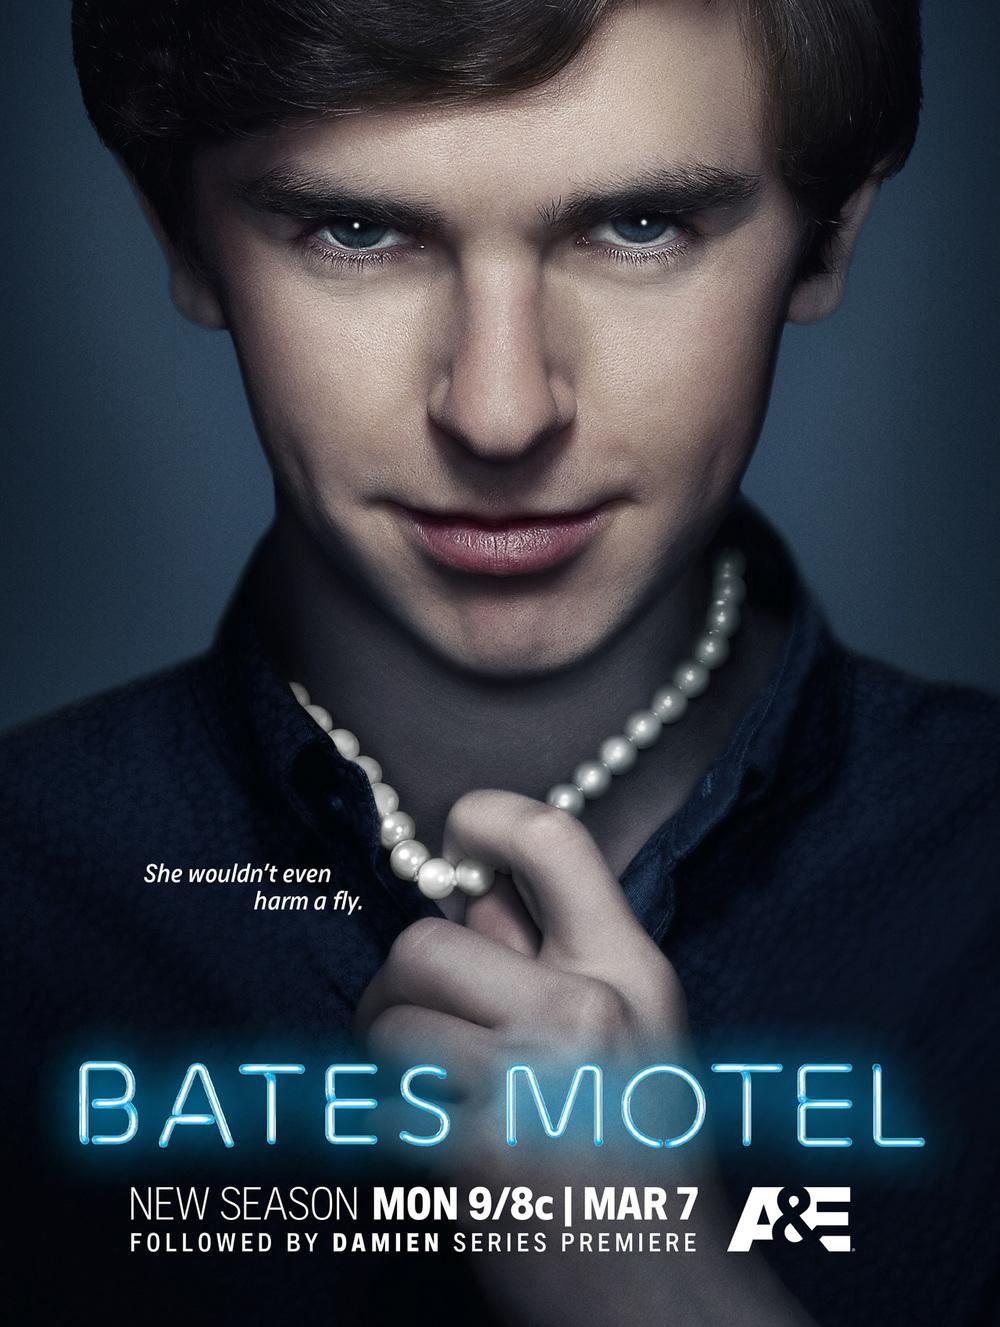 Bates Motel Season 4 Poster.jpg